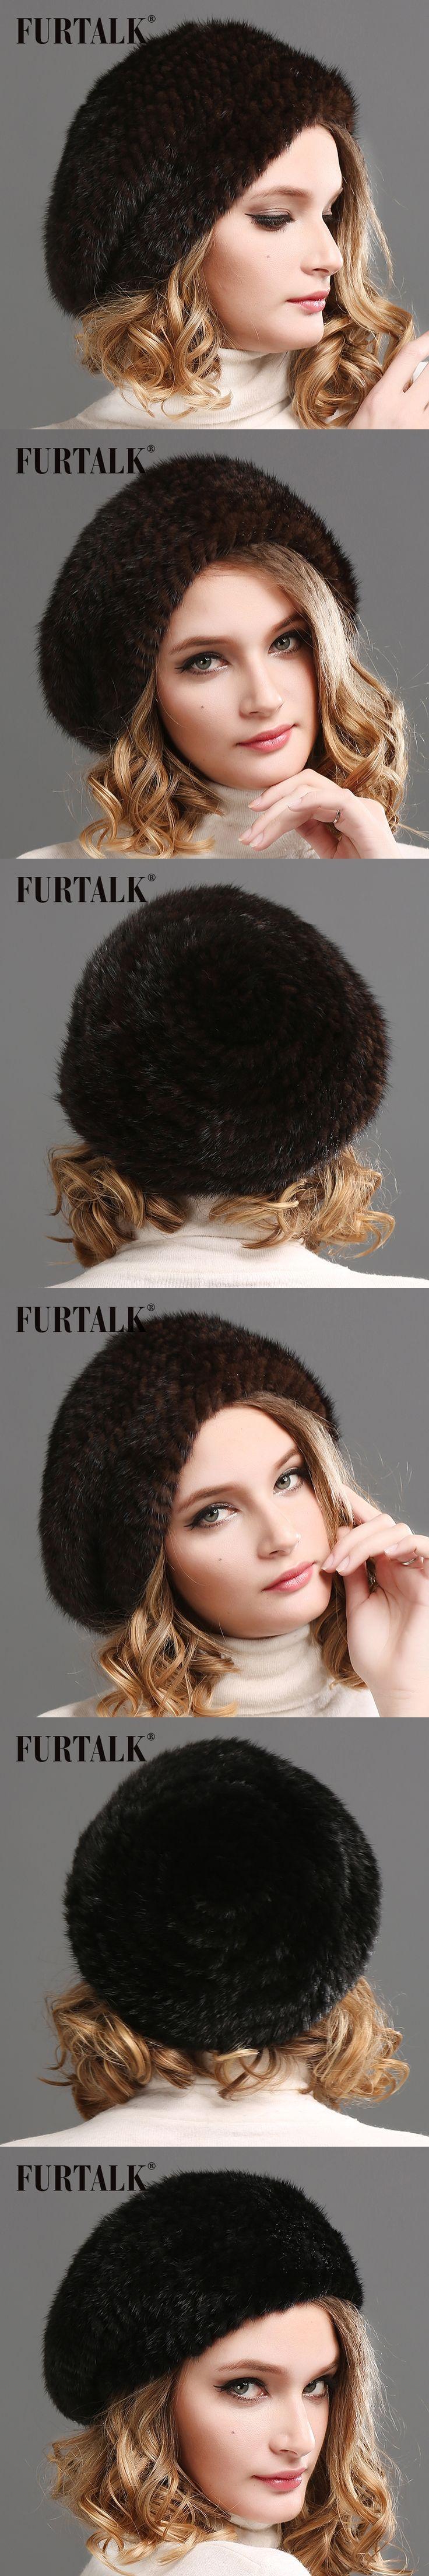 2015 FURTALK new fur beret natural mink fur bobble hat for women